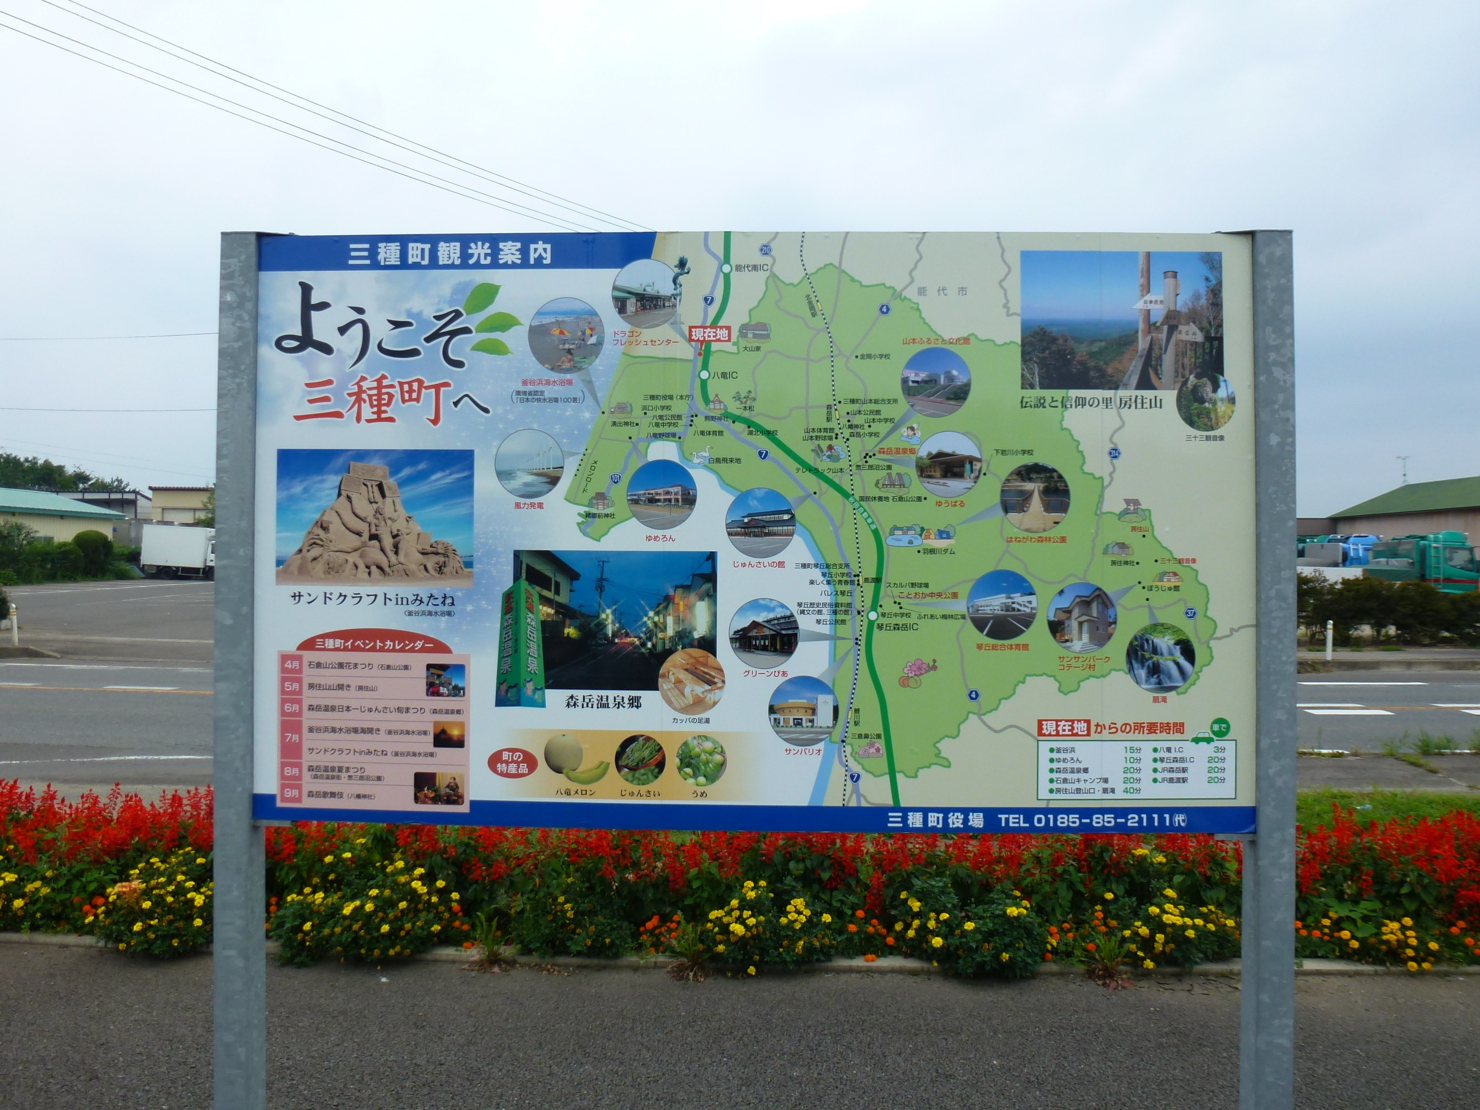 f:id:ToshUeno:20130915063106j:plain